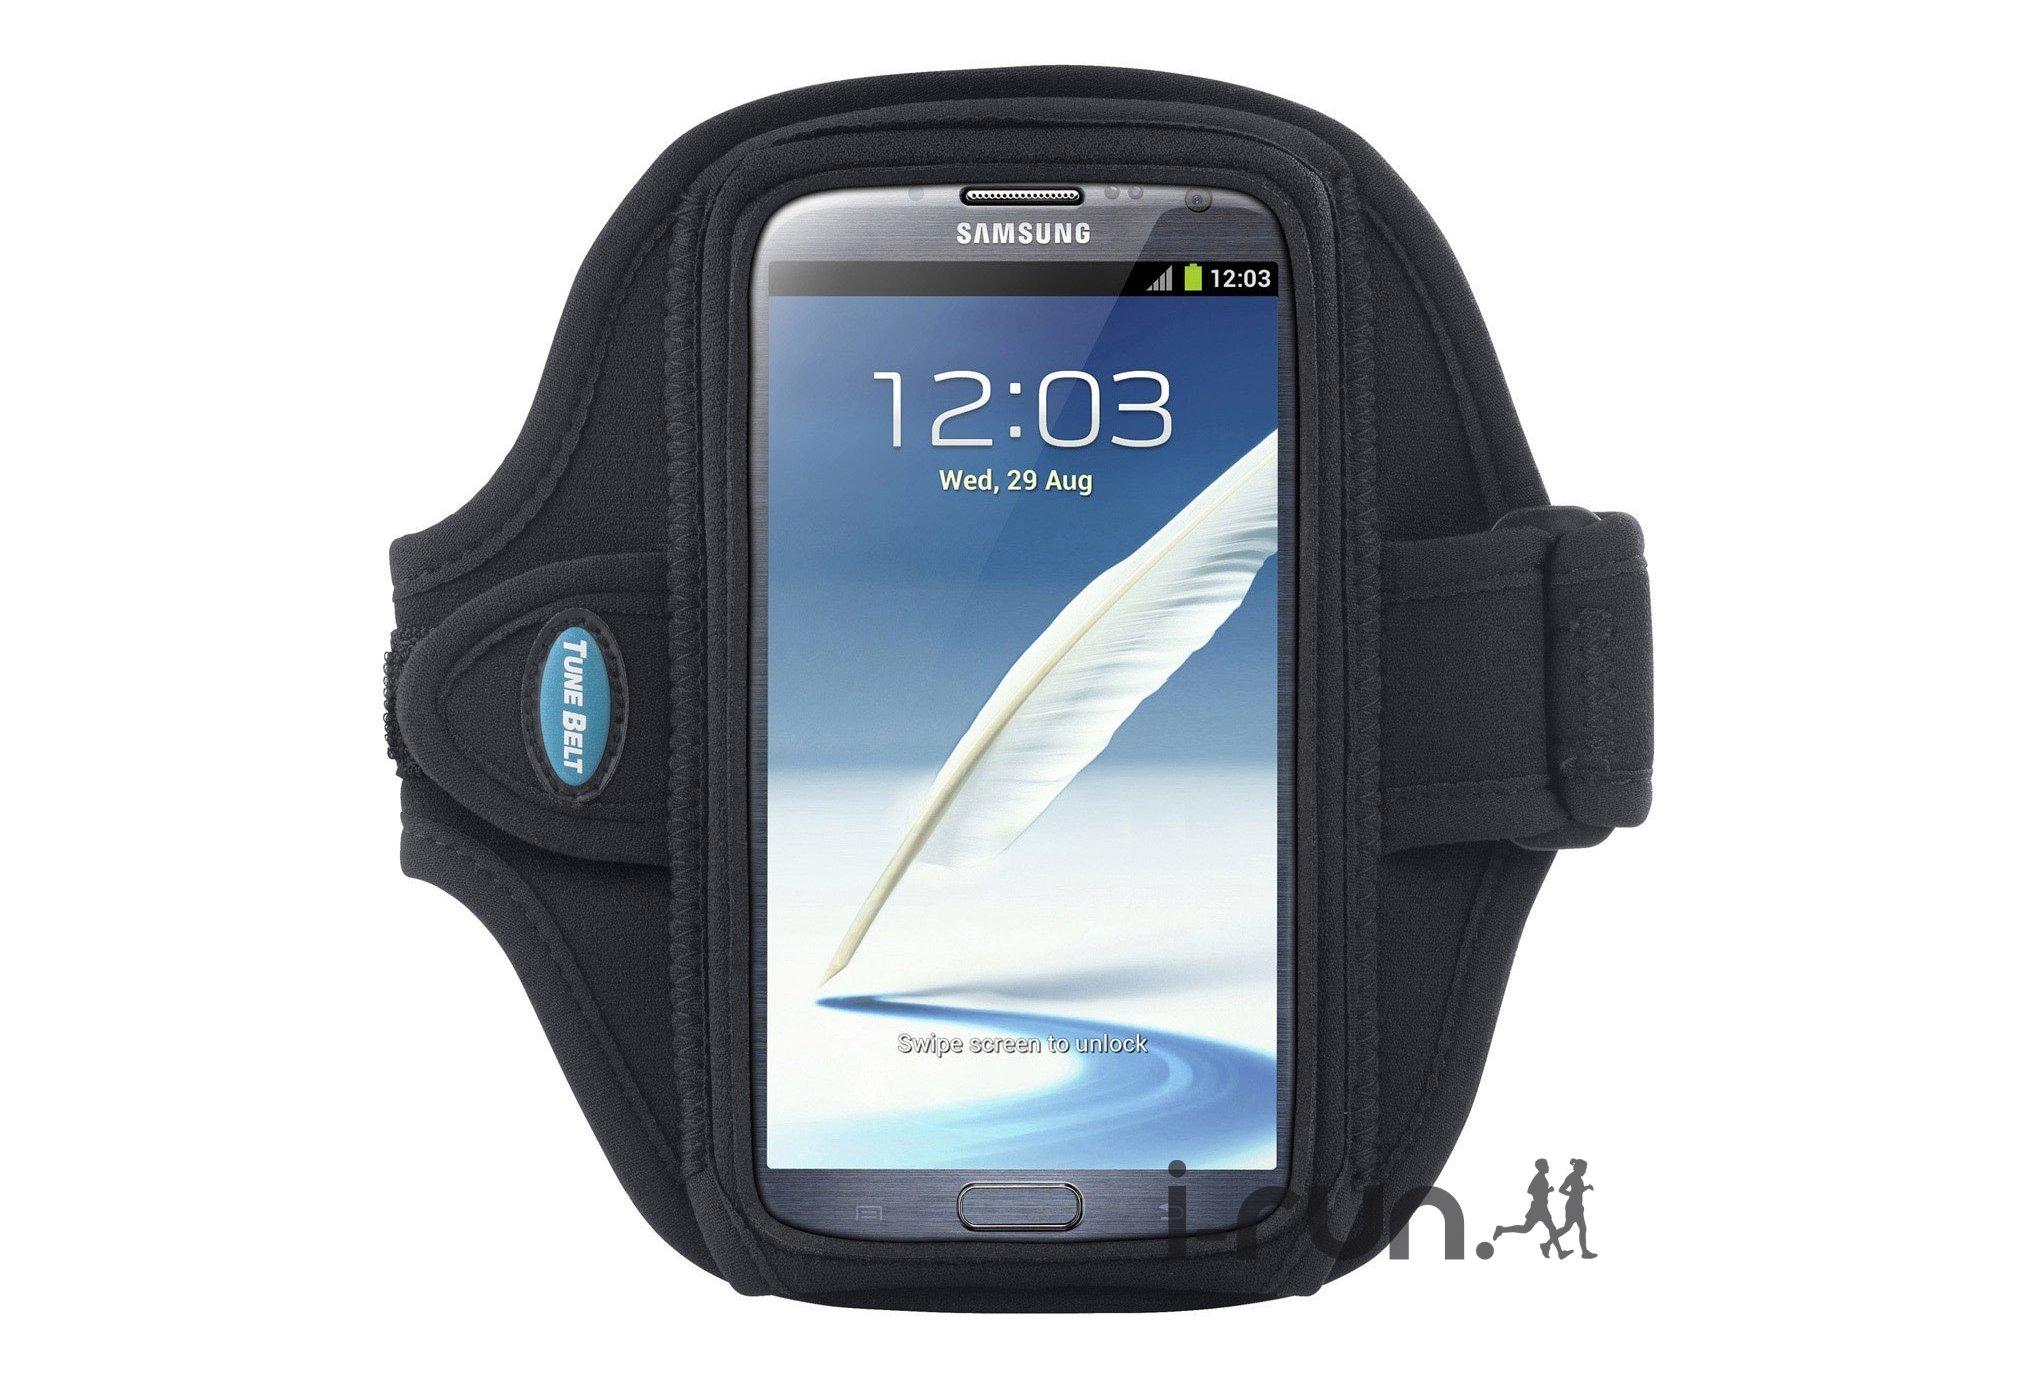 Tune Belt brassard ab85 samsung galaxy s iii avec coque accessoires téléphone